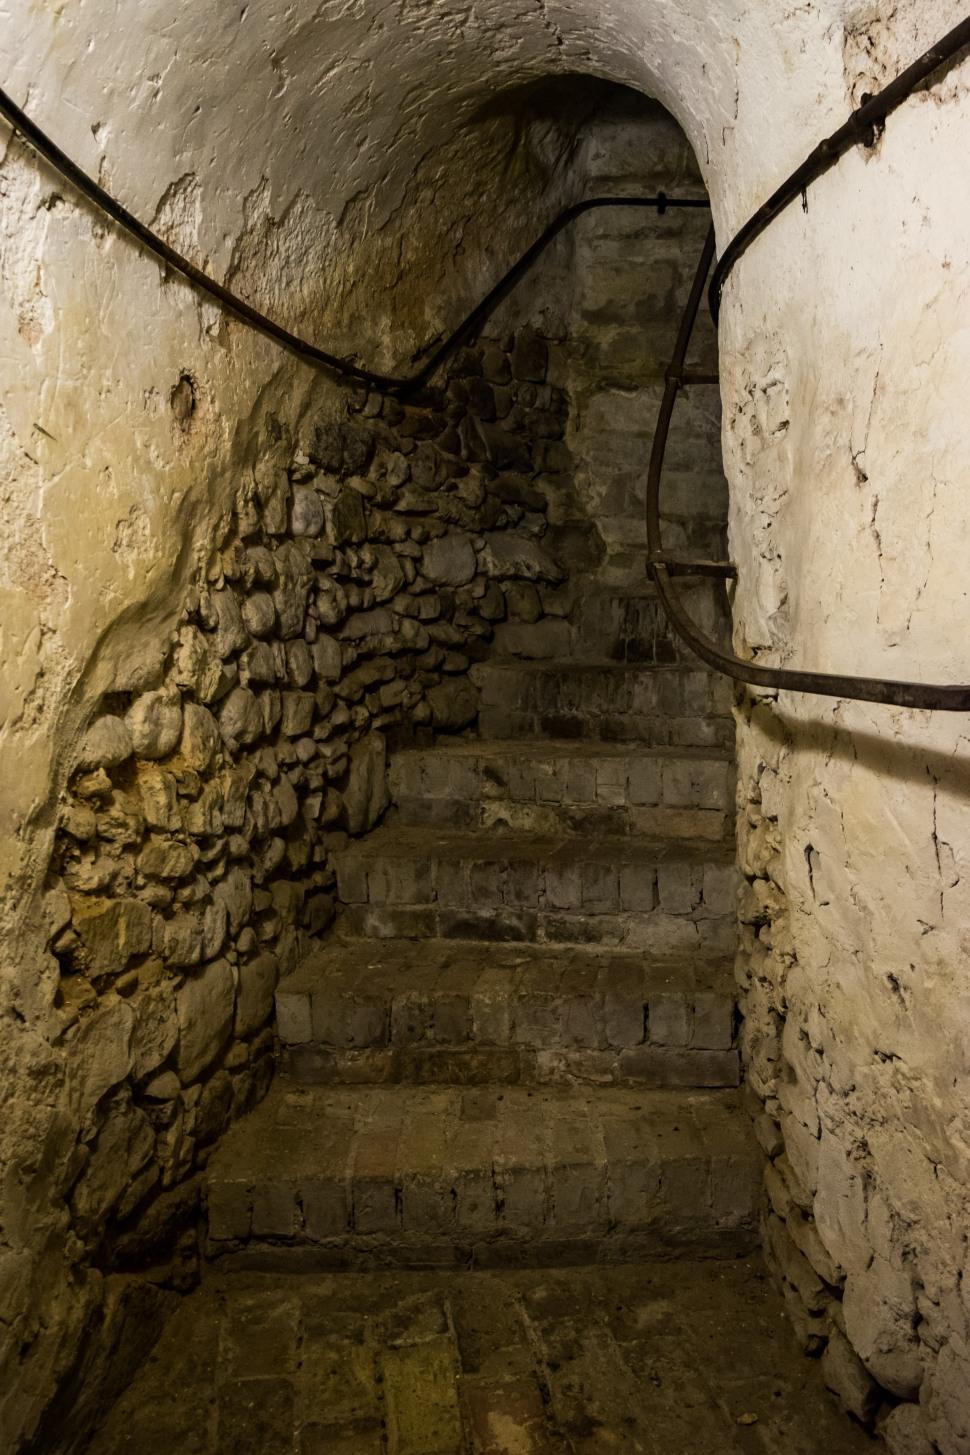 Crypt staircase